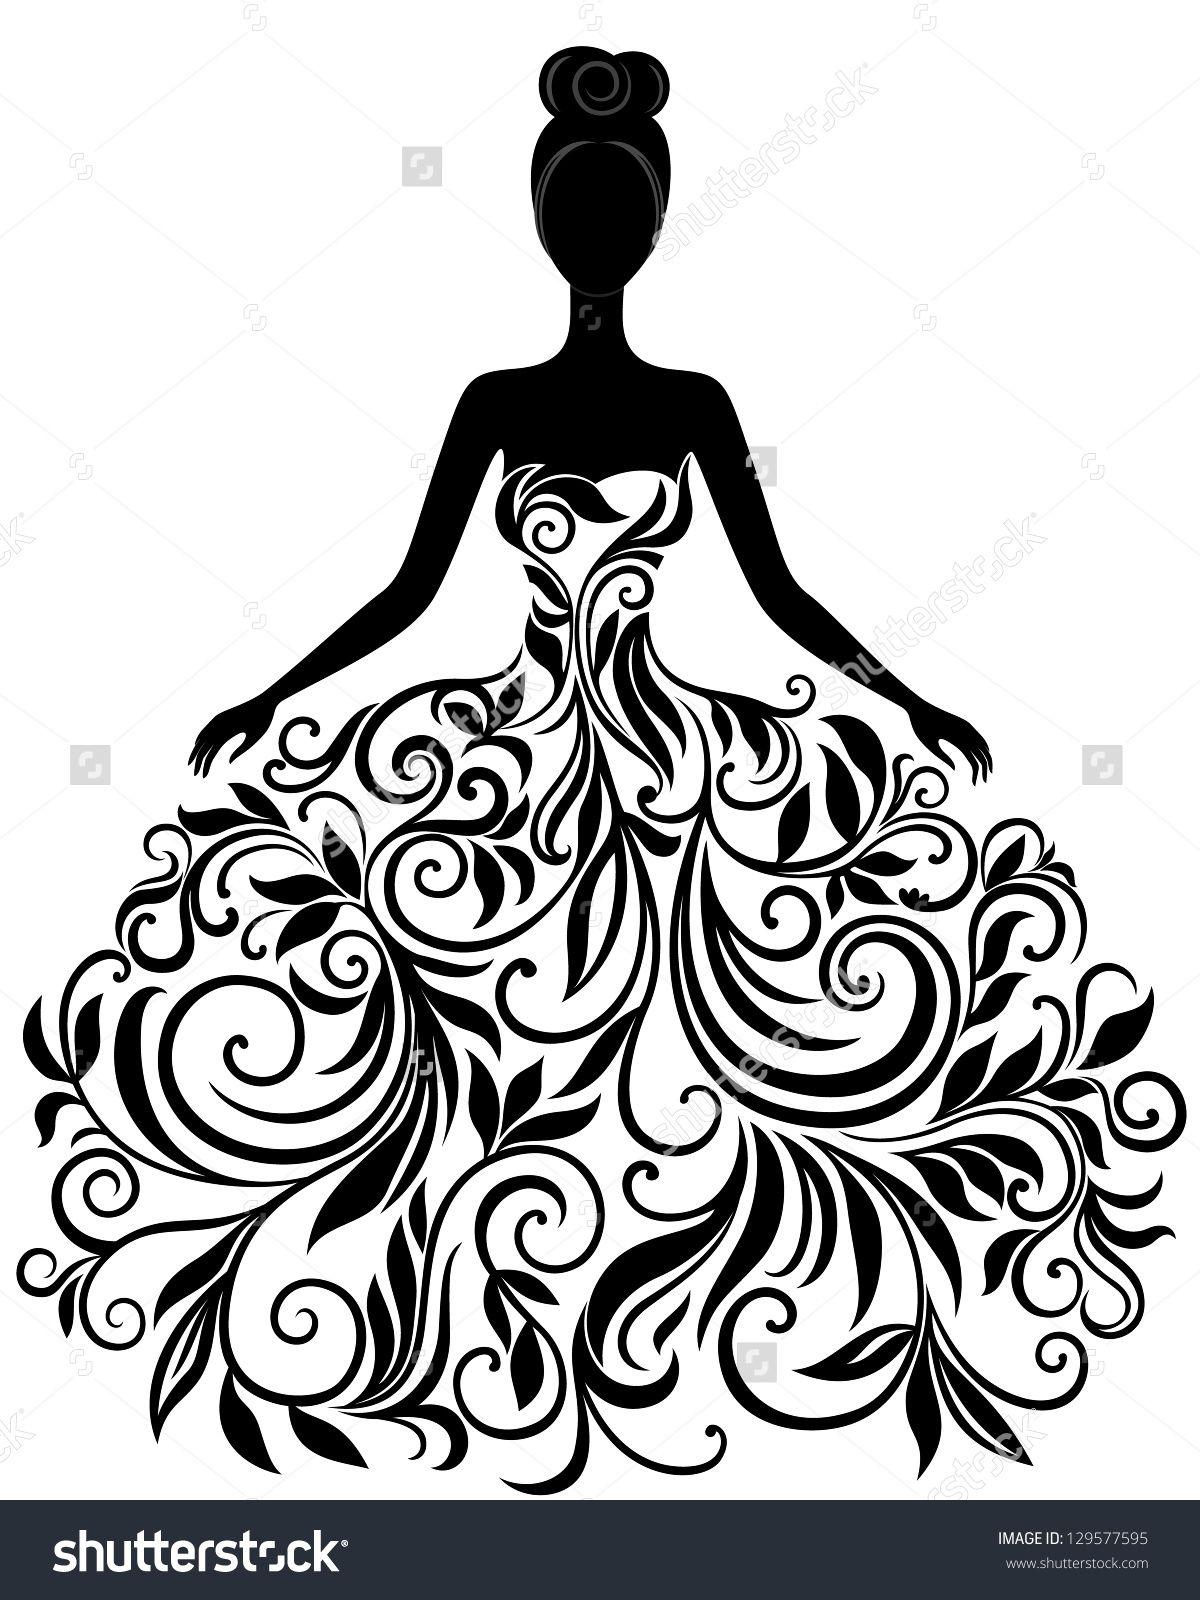 Pin by mila svir. Bridal clipart elegance